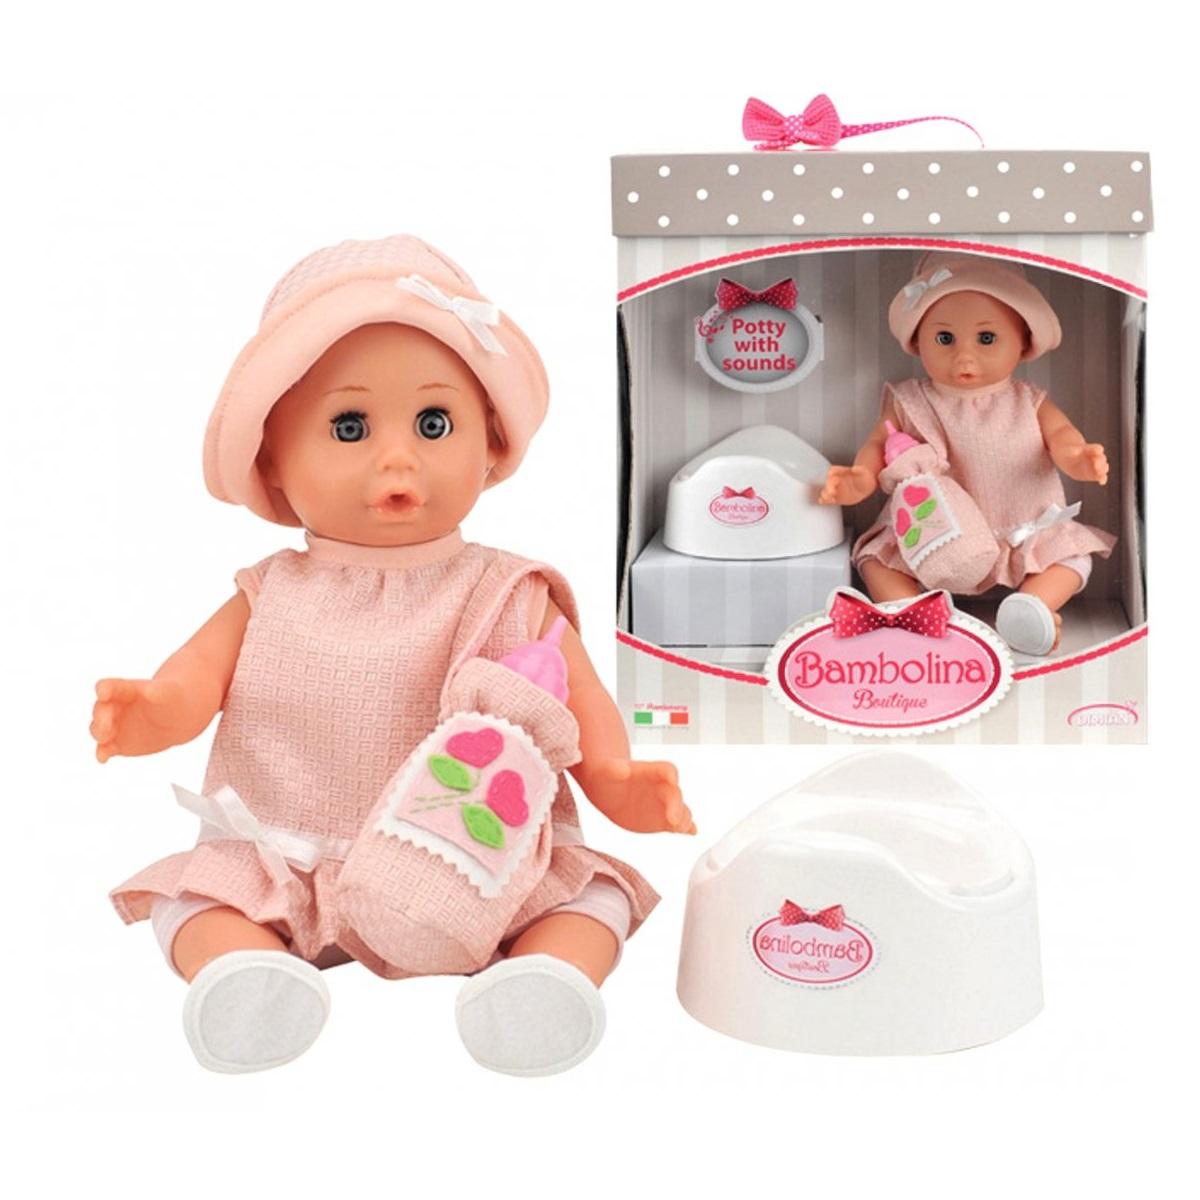 Кукла Bambolina Boutique с аксессуарами, 36 см.Пупсы<br>Кукла Bambolina Boutique с аксессуарами, 36 см.<br>